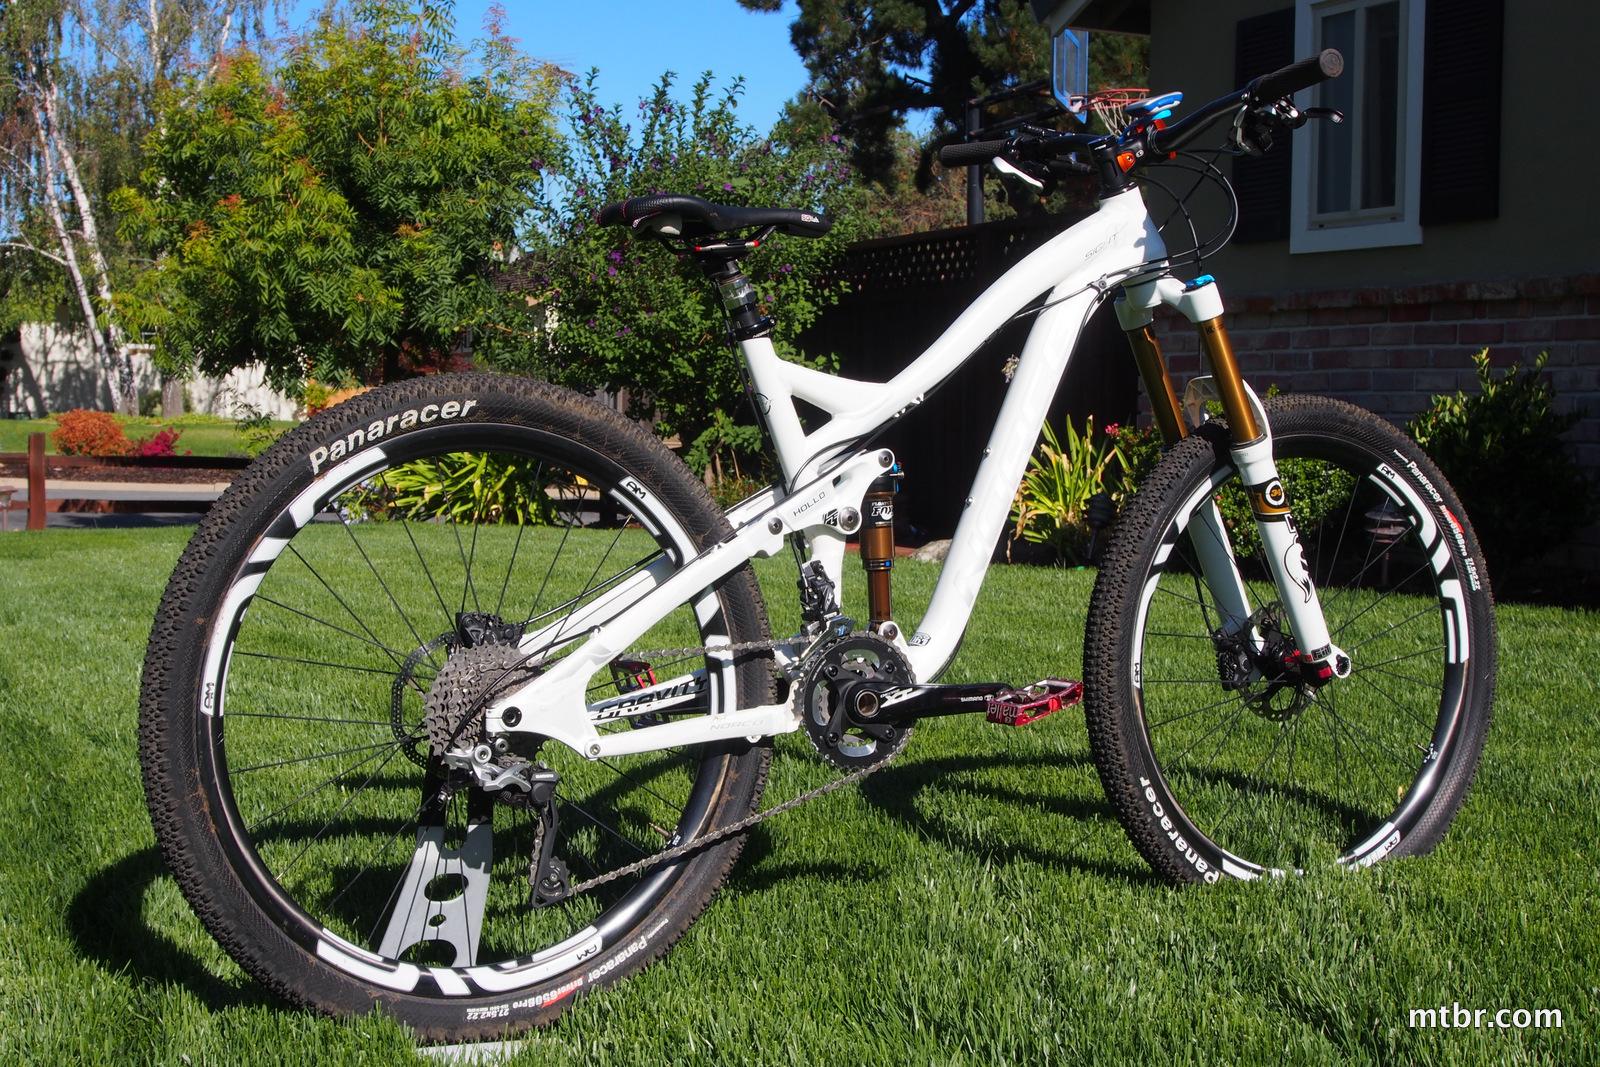 27 5 All Mountain Enduro Bike Round Up Mtbr Com